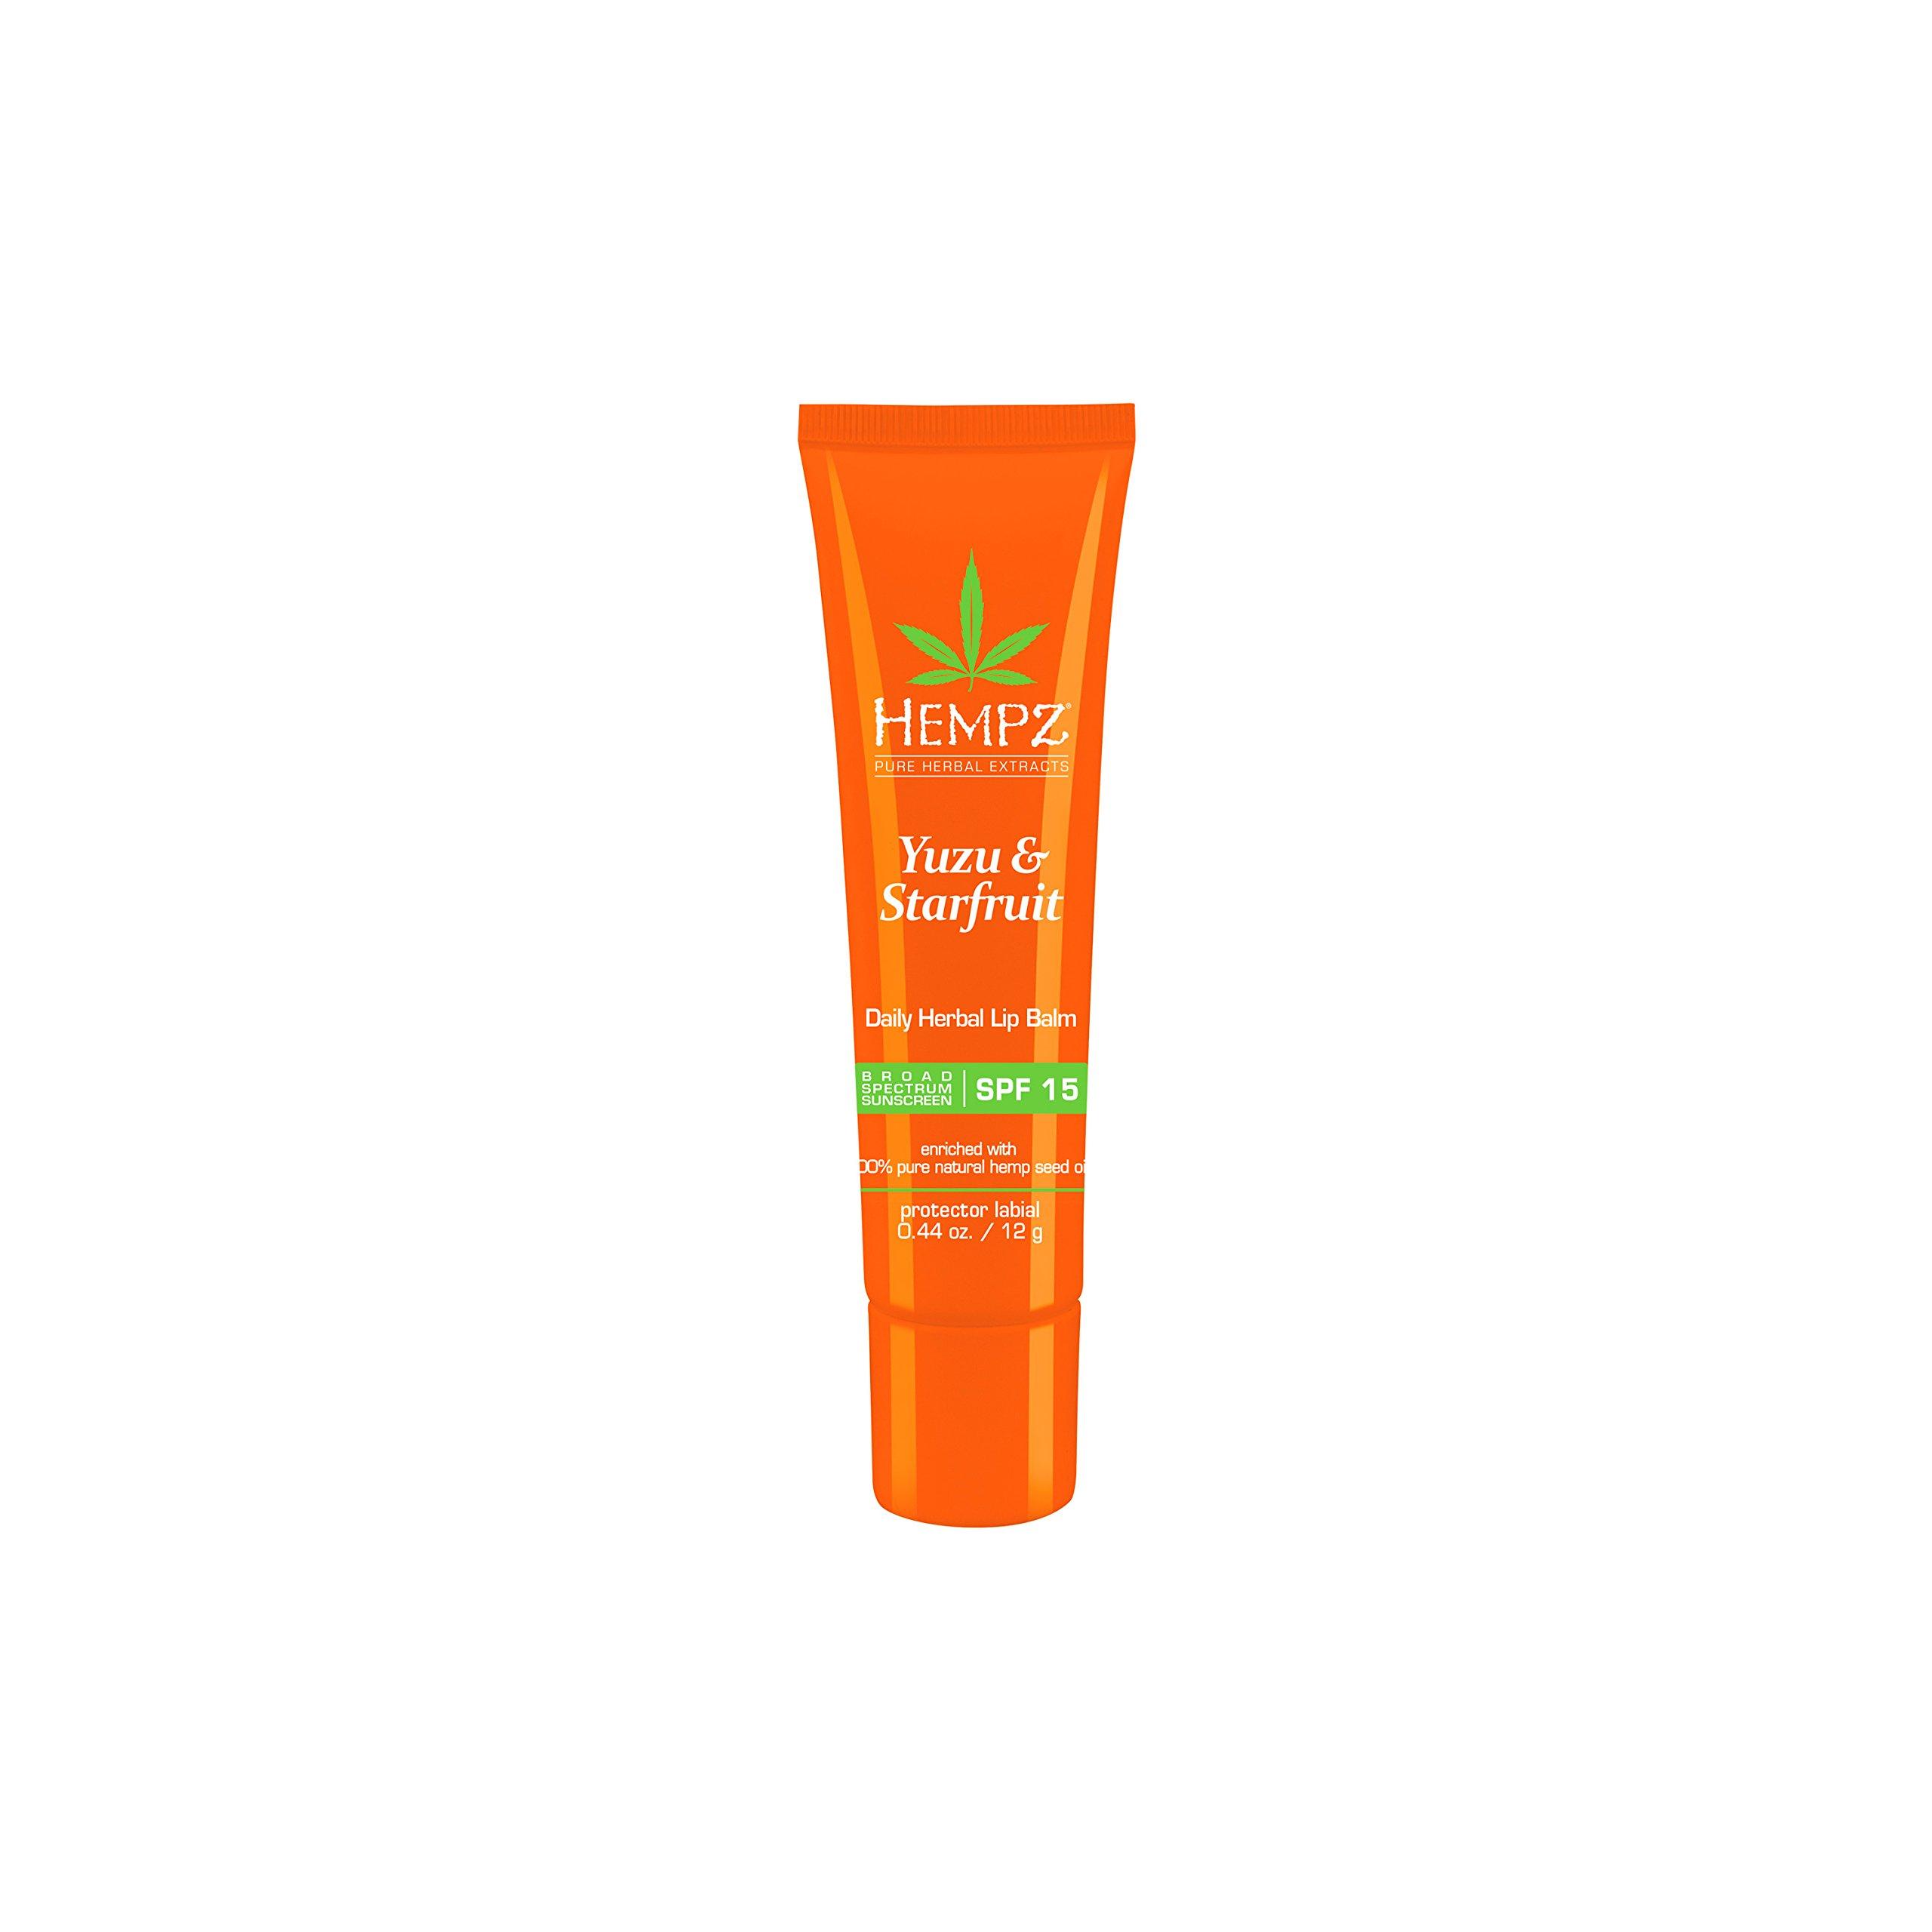 Hempz Yuzu & Starfruit Daily Herbal Lip Balm with SPF 15, 0.44 Ounce